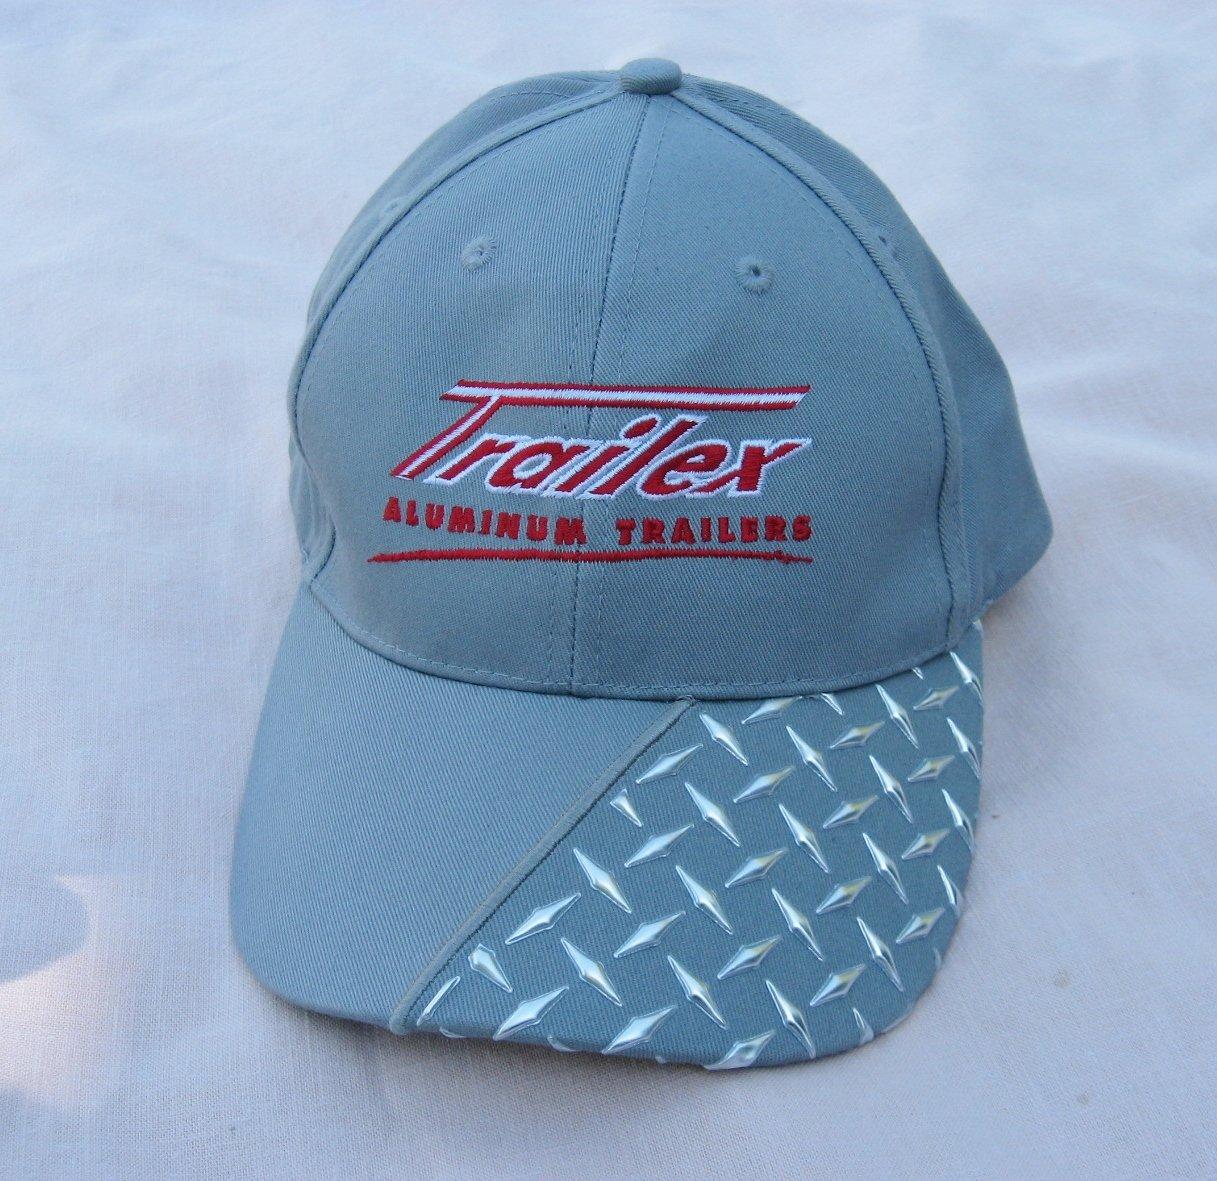 Gray Trailex Aluminum Trailer Baseball Cap Adjustable Advertising